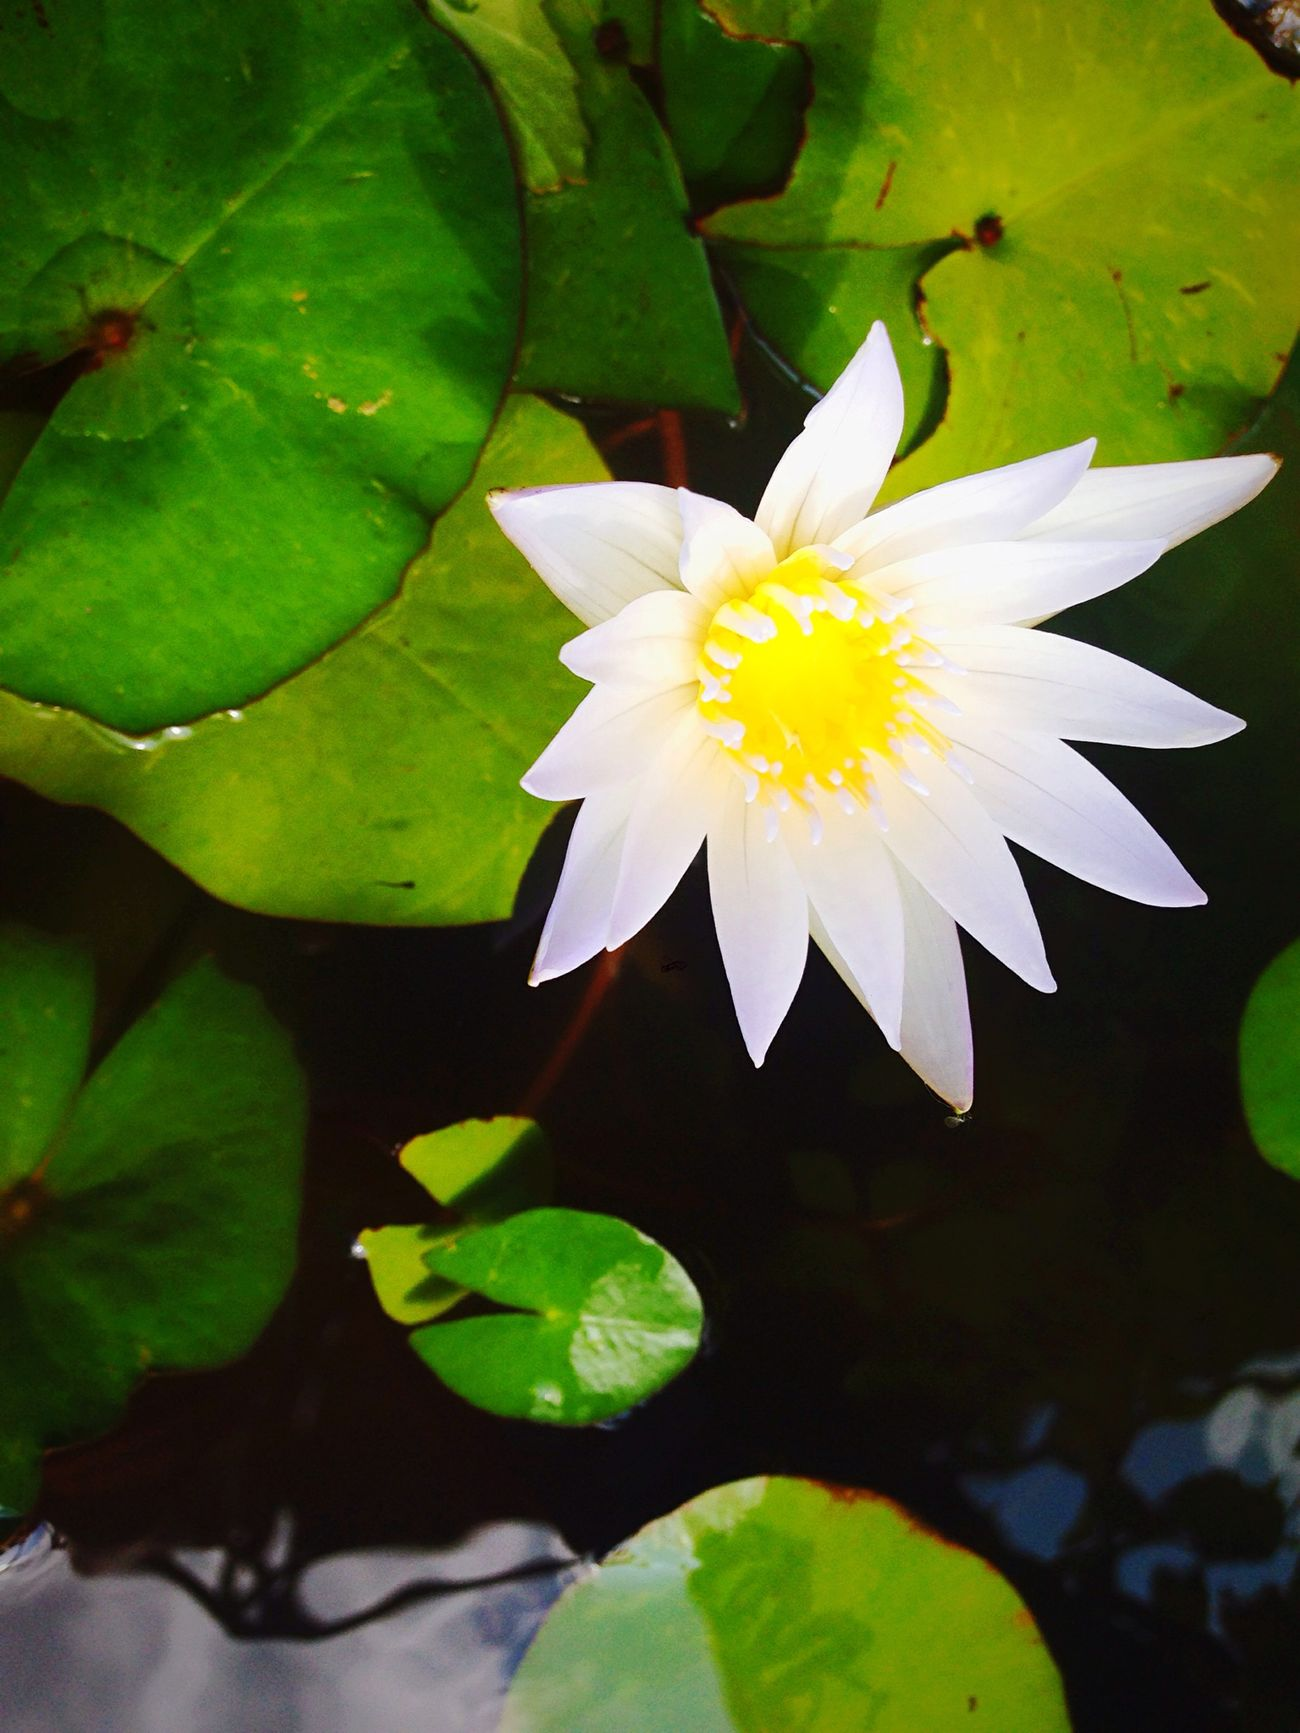 Taking Photos Relaxing flower